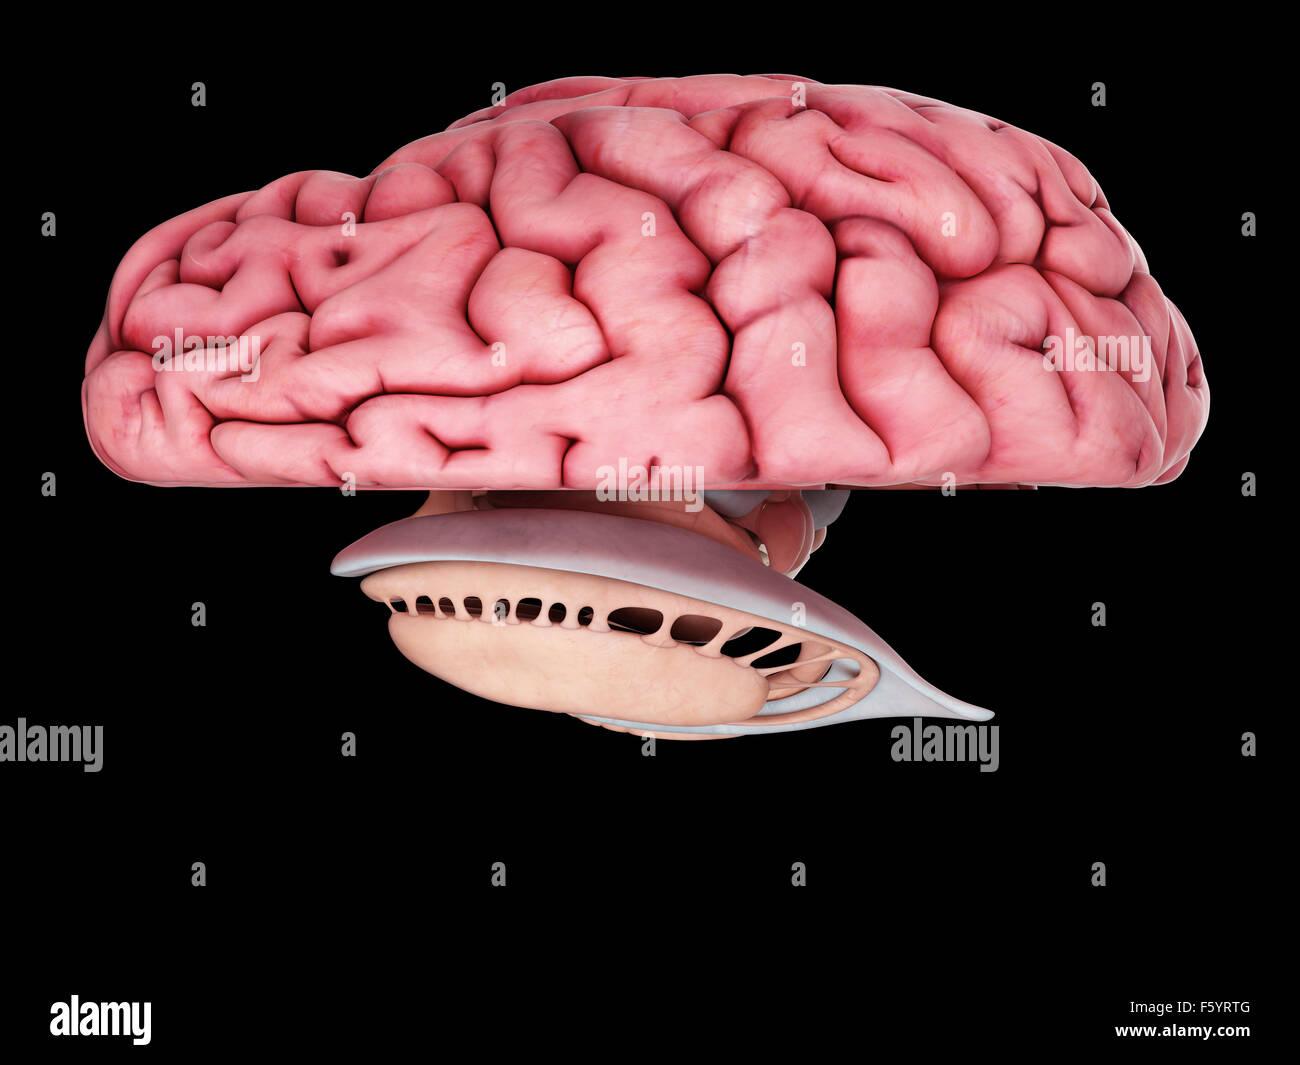 Amygdala Of The Brain Stockfotos & Amygdala Of The Brain Bilder - Alamy